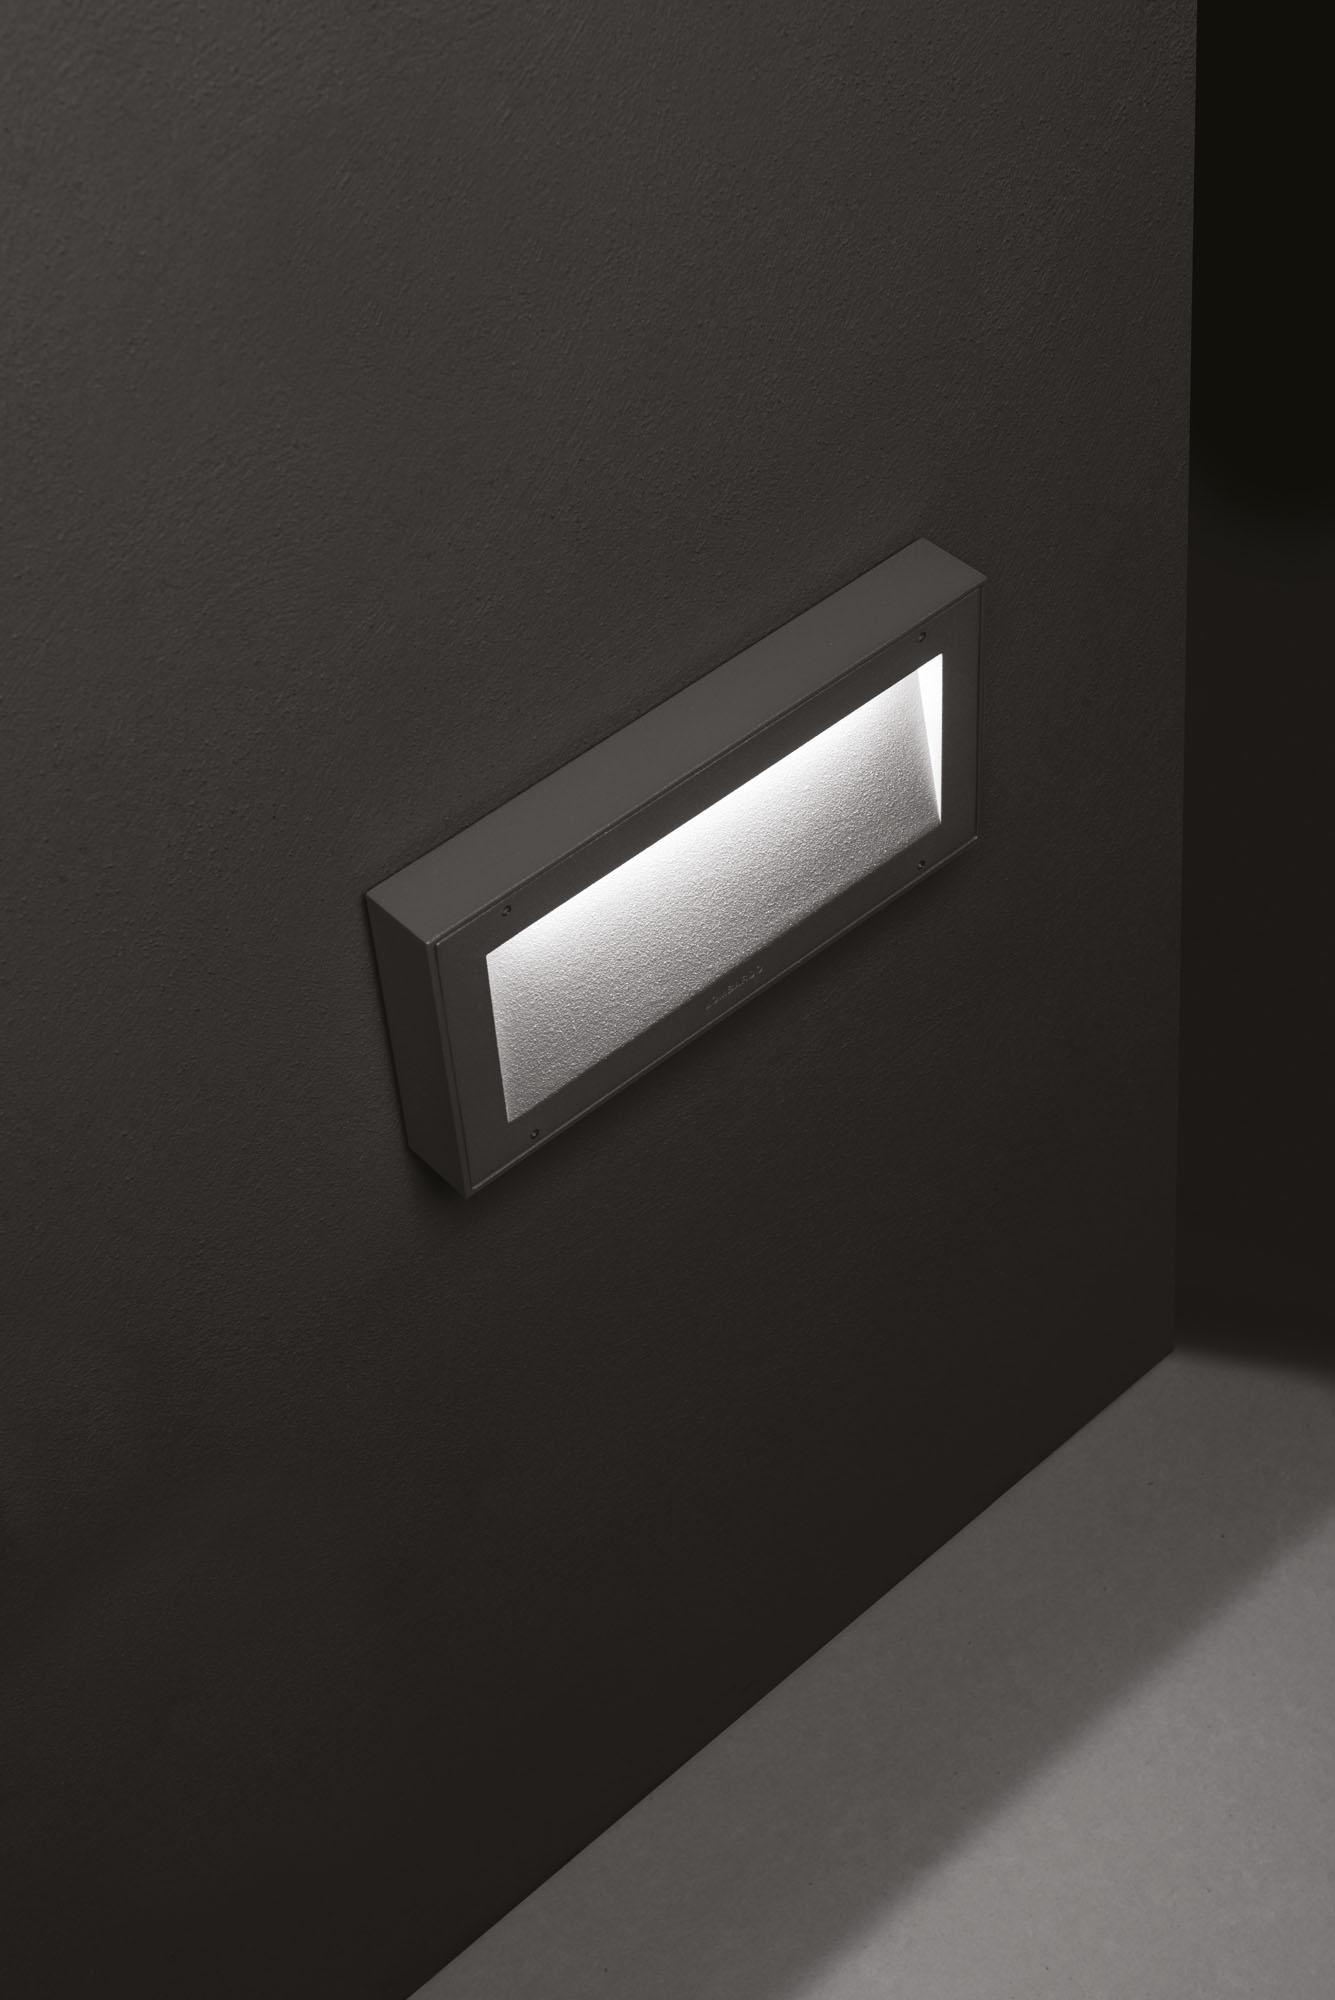 Välisvalgusti Koi 220, LED 9W 650lm 3000K; alumiinium, corten; IP66 IK10